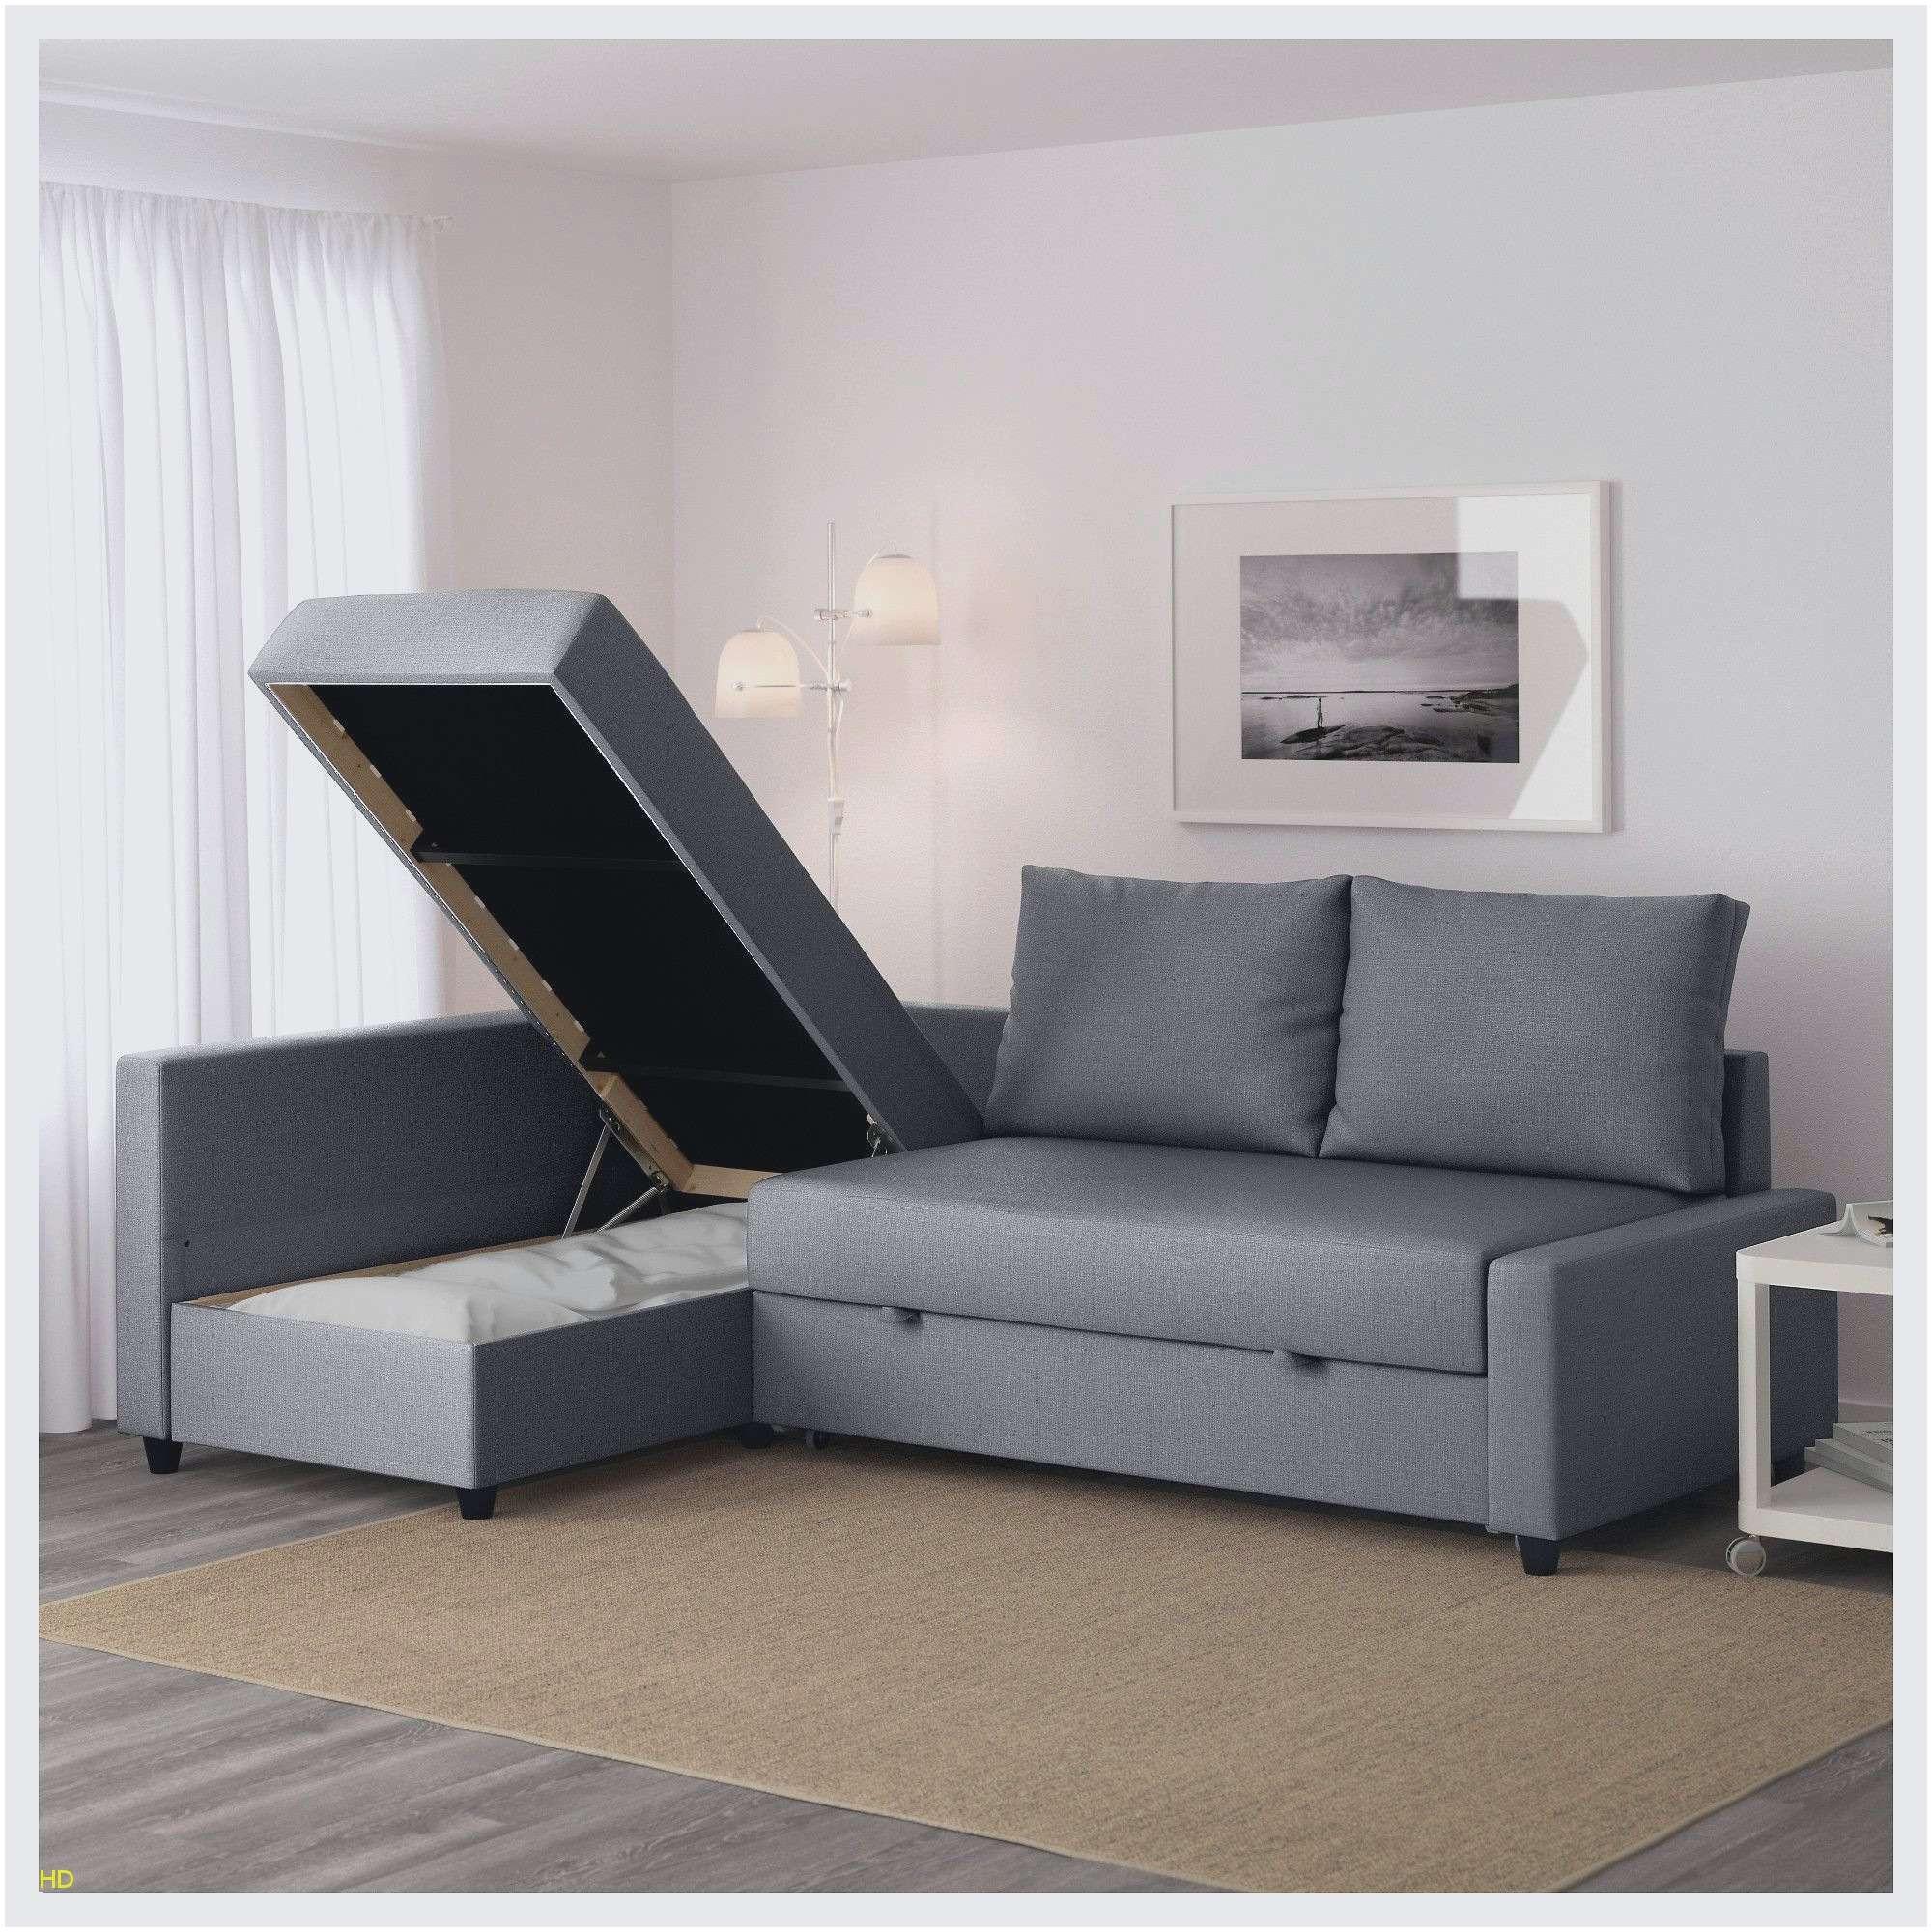 impressionnant ikea futon neu unique ikea ps sofa bed outtwincitiesfilmfestival pour alternative ikea banquette convertible